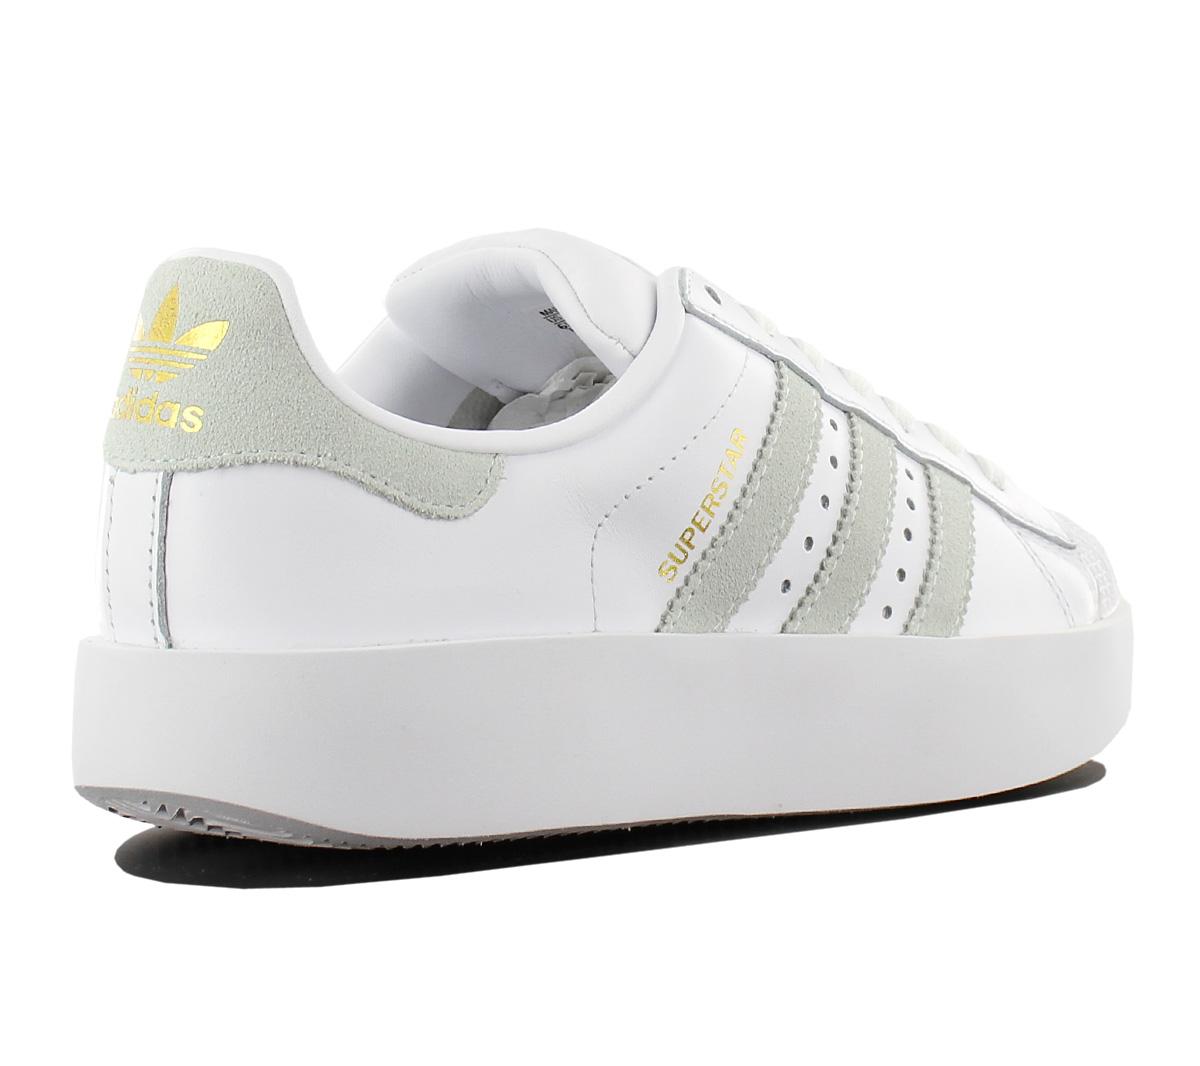 f5c2292f2245fb Adidas Originals Superstar Bold W Sneaker Donna Plateau Scarpe ...